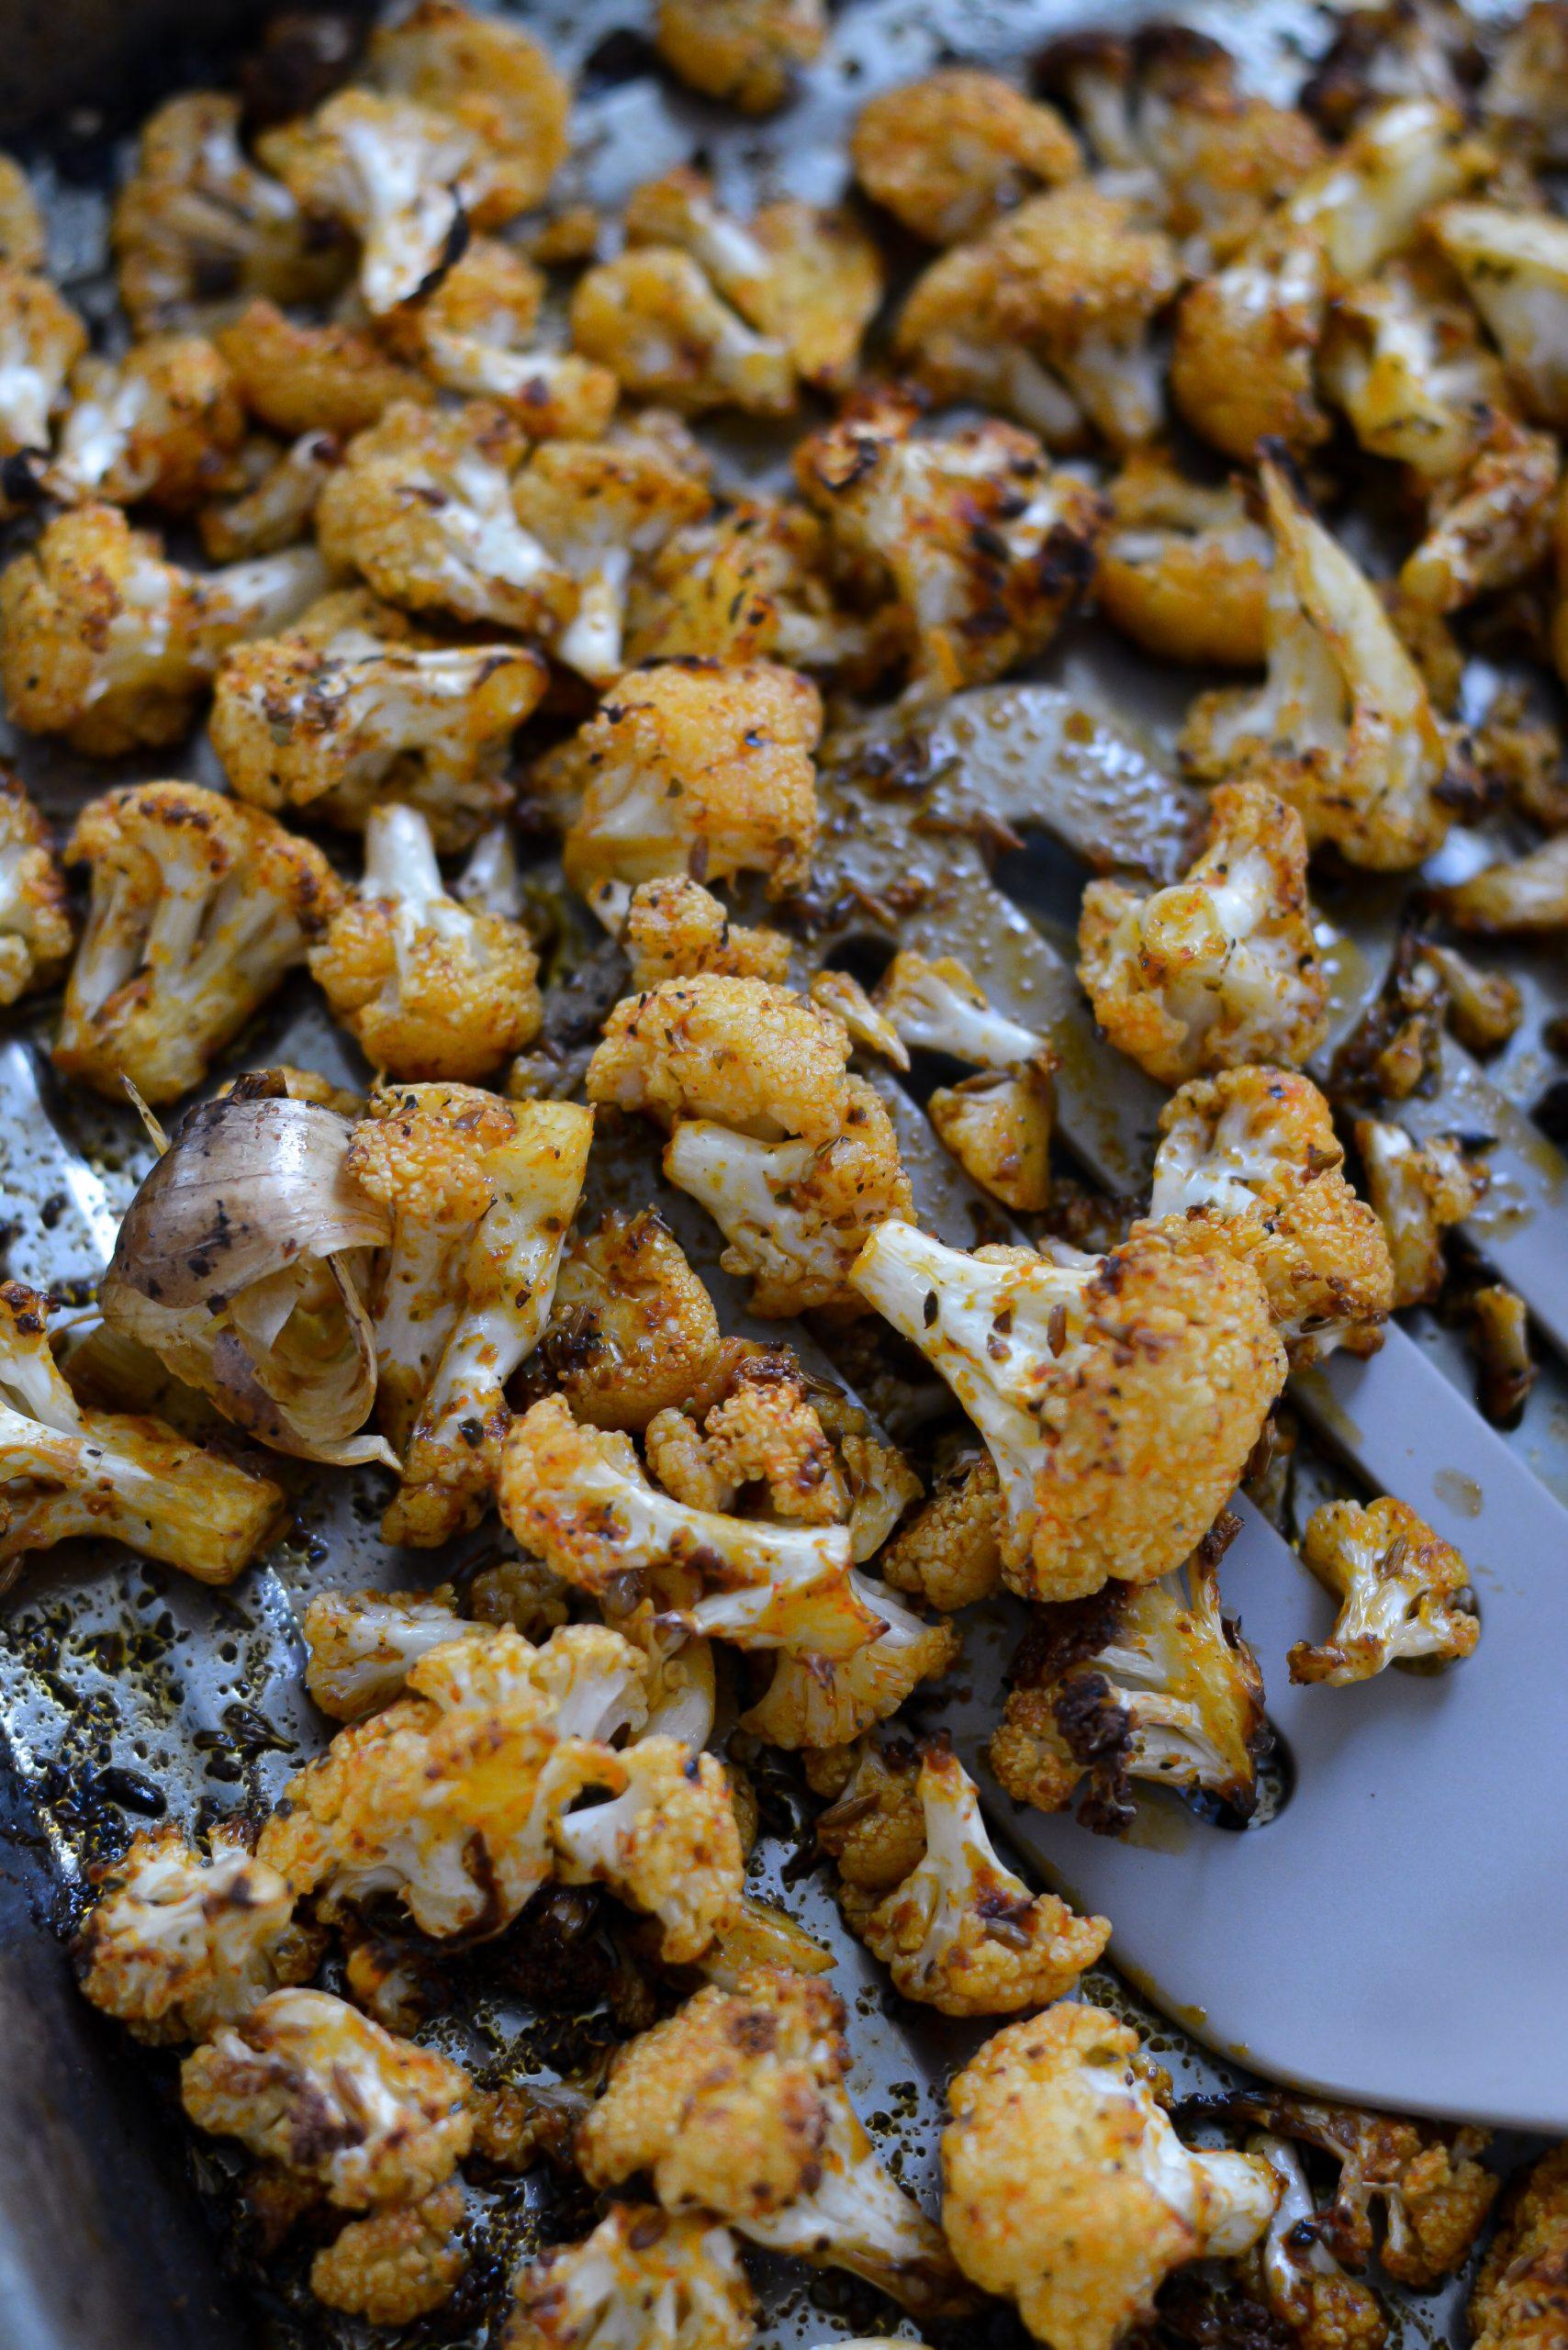 Pâtes Crémeuses Vegan au Chou-Fleur Bolognaise / Easy Vegan Creamy Cauliflower Bolognese Pasta